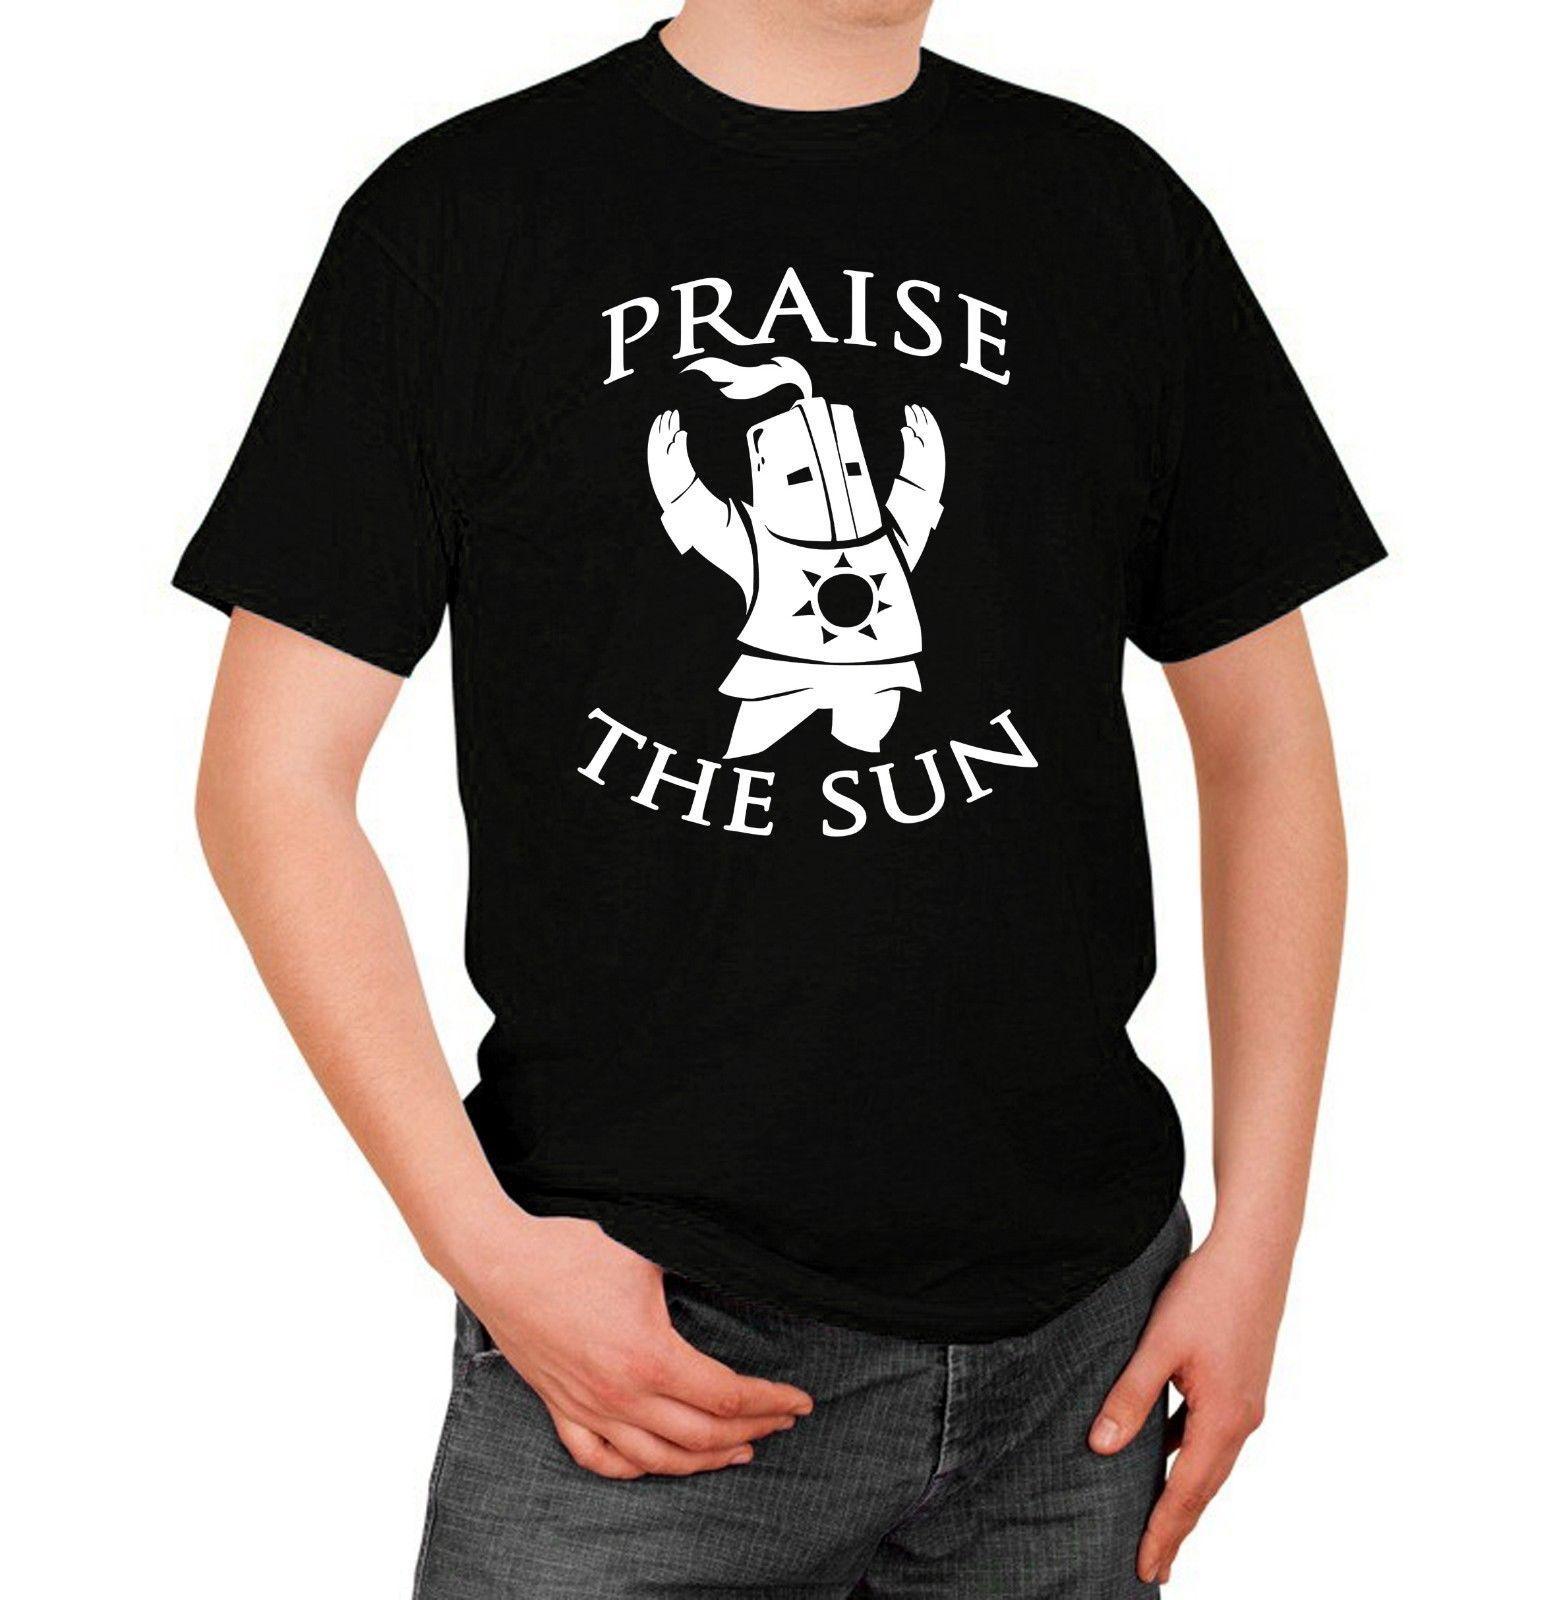 c20ea4008 Dark Souls T Shirt Maglia Praise The Sun Prega Il Sole Videogioco Gioco  Game Funny Casual Tshirt Graphic T Shirt Design Own T Shirt From  Funnybonetees, ...